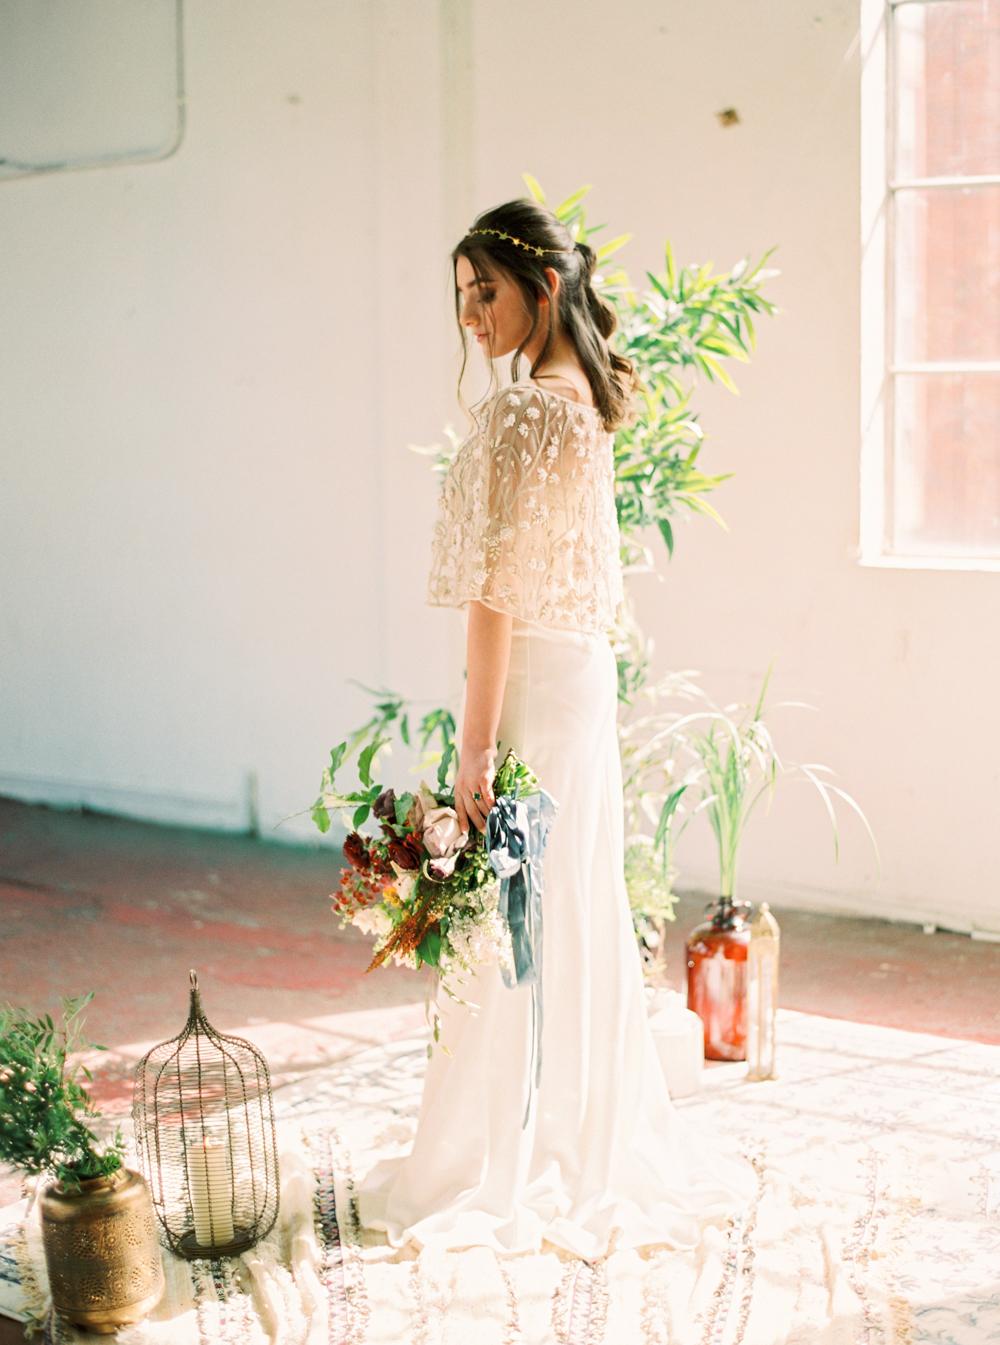 moroccan_floral_boho_vibrant_jewel_tone_nuetral_industrial_wedding_inspiration002.jpg